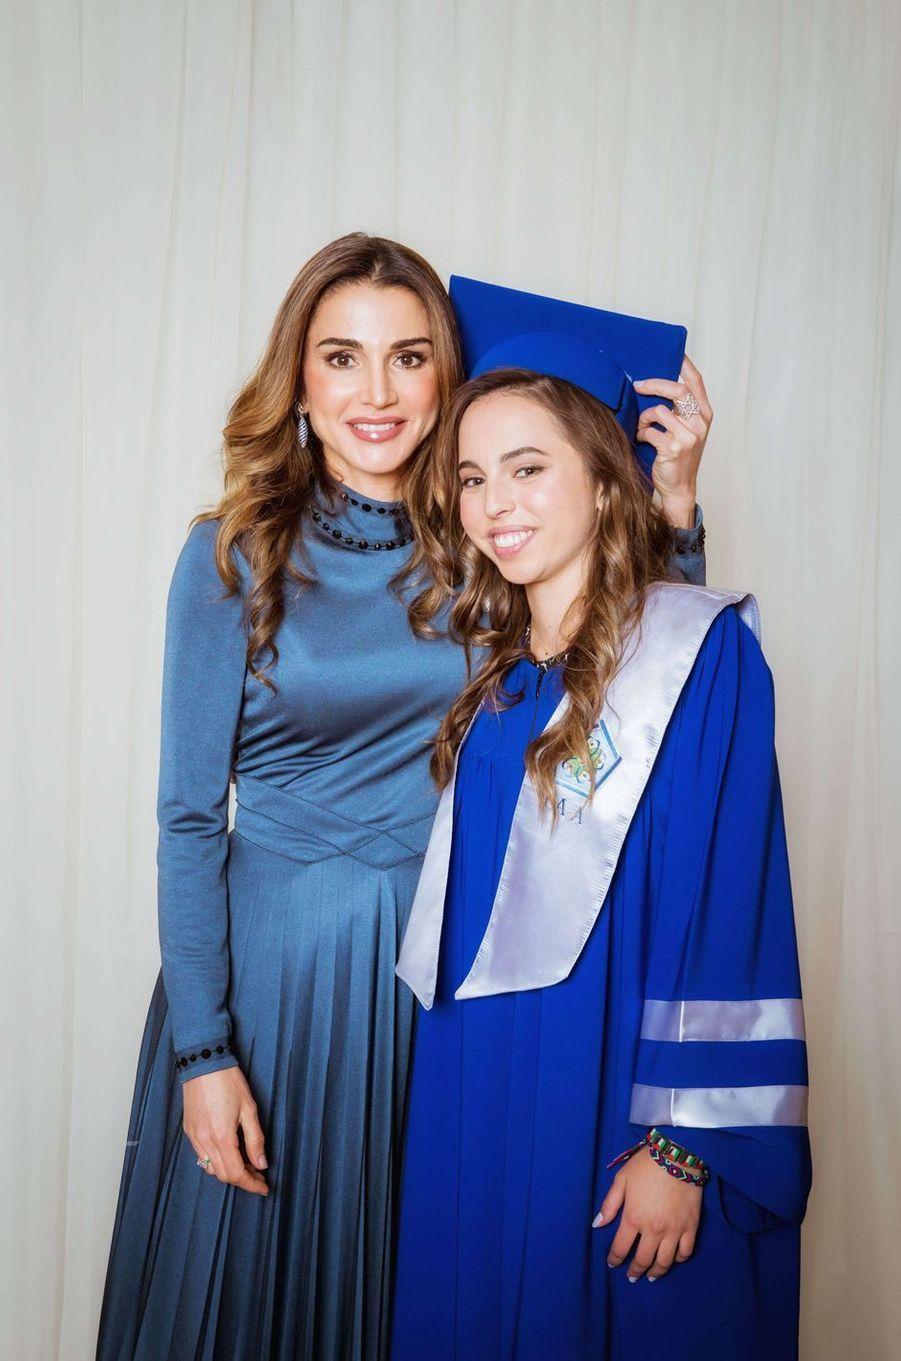 La princesse Salma de Jordanie avec sa mère la reine Rania, le 22 mai 2018